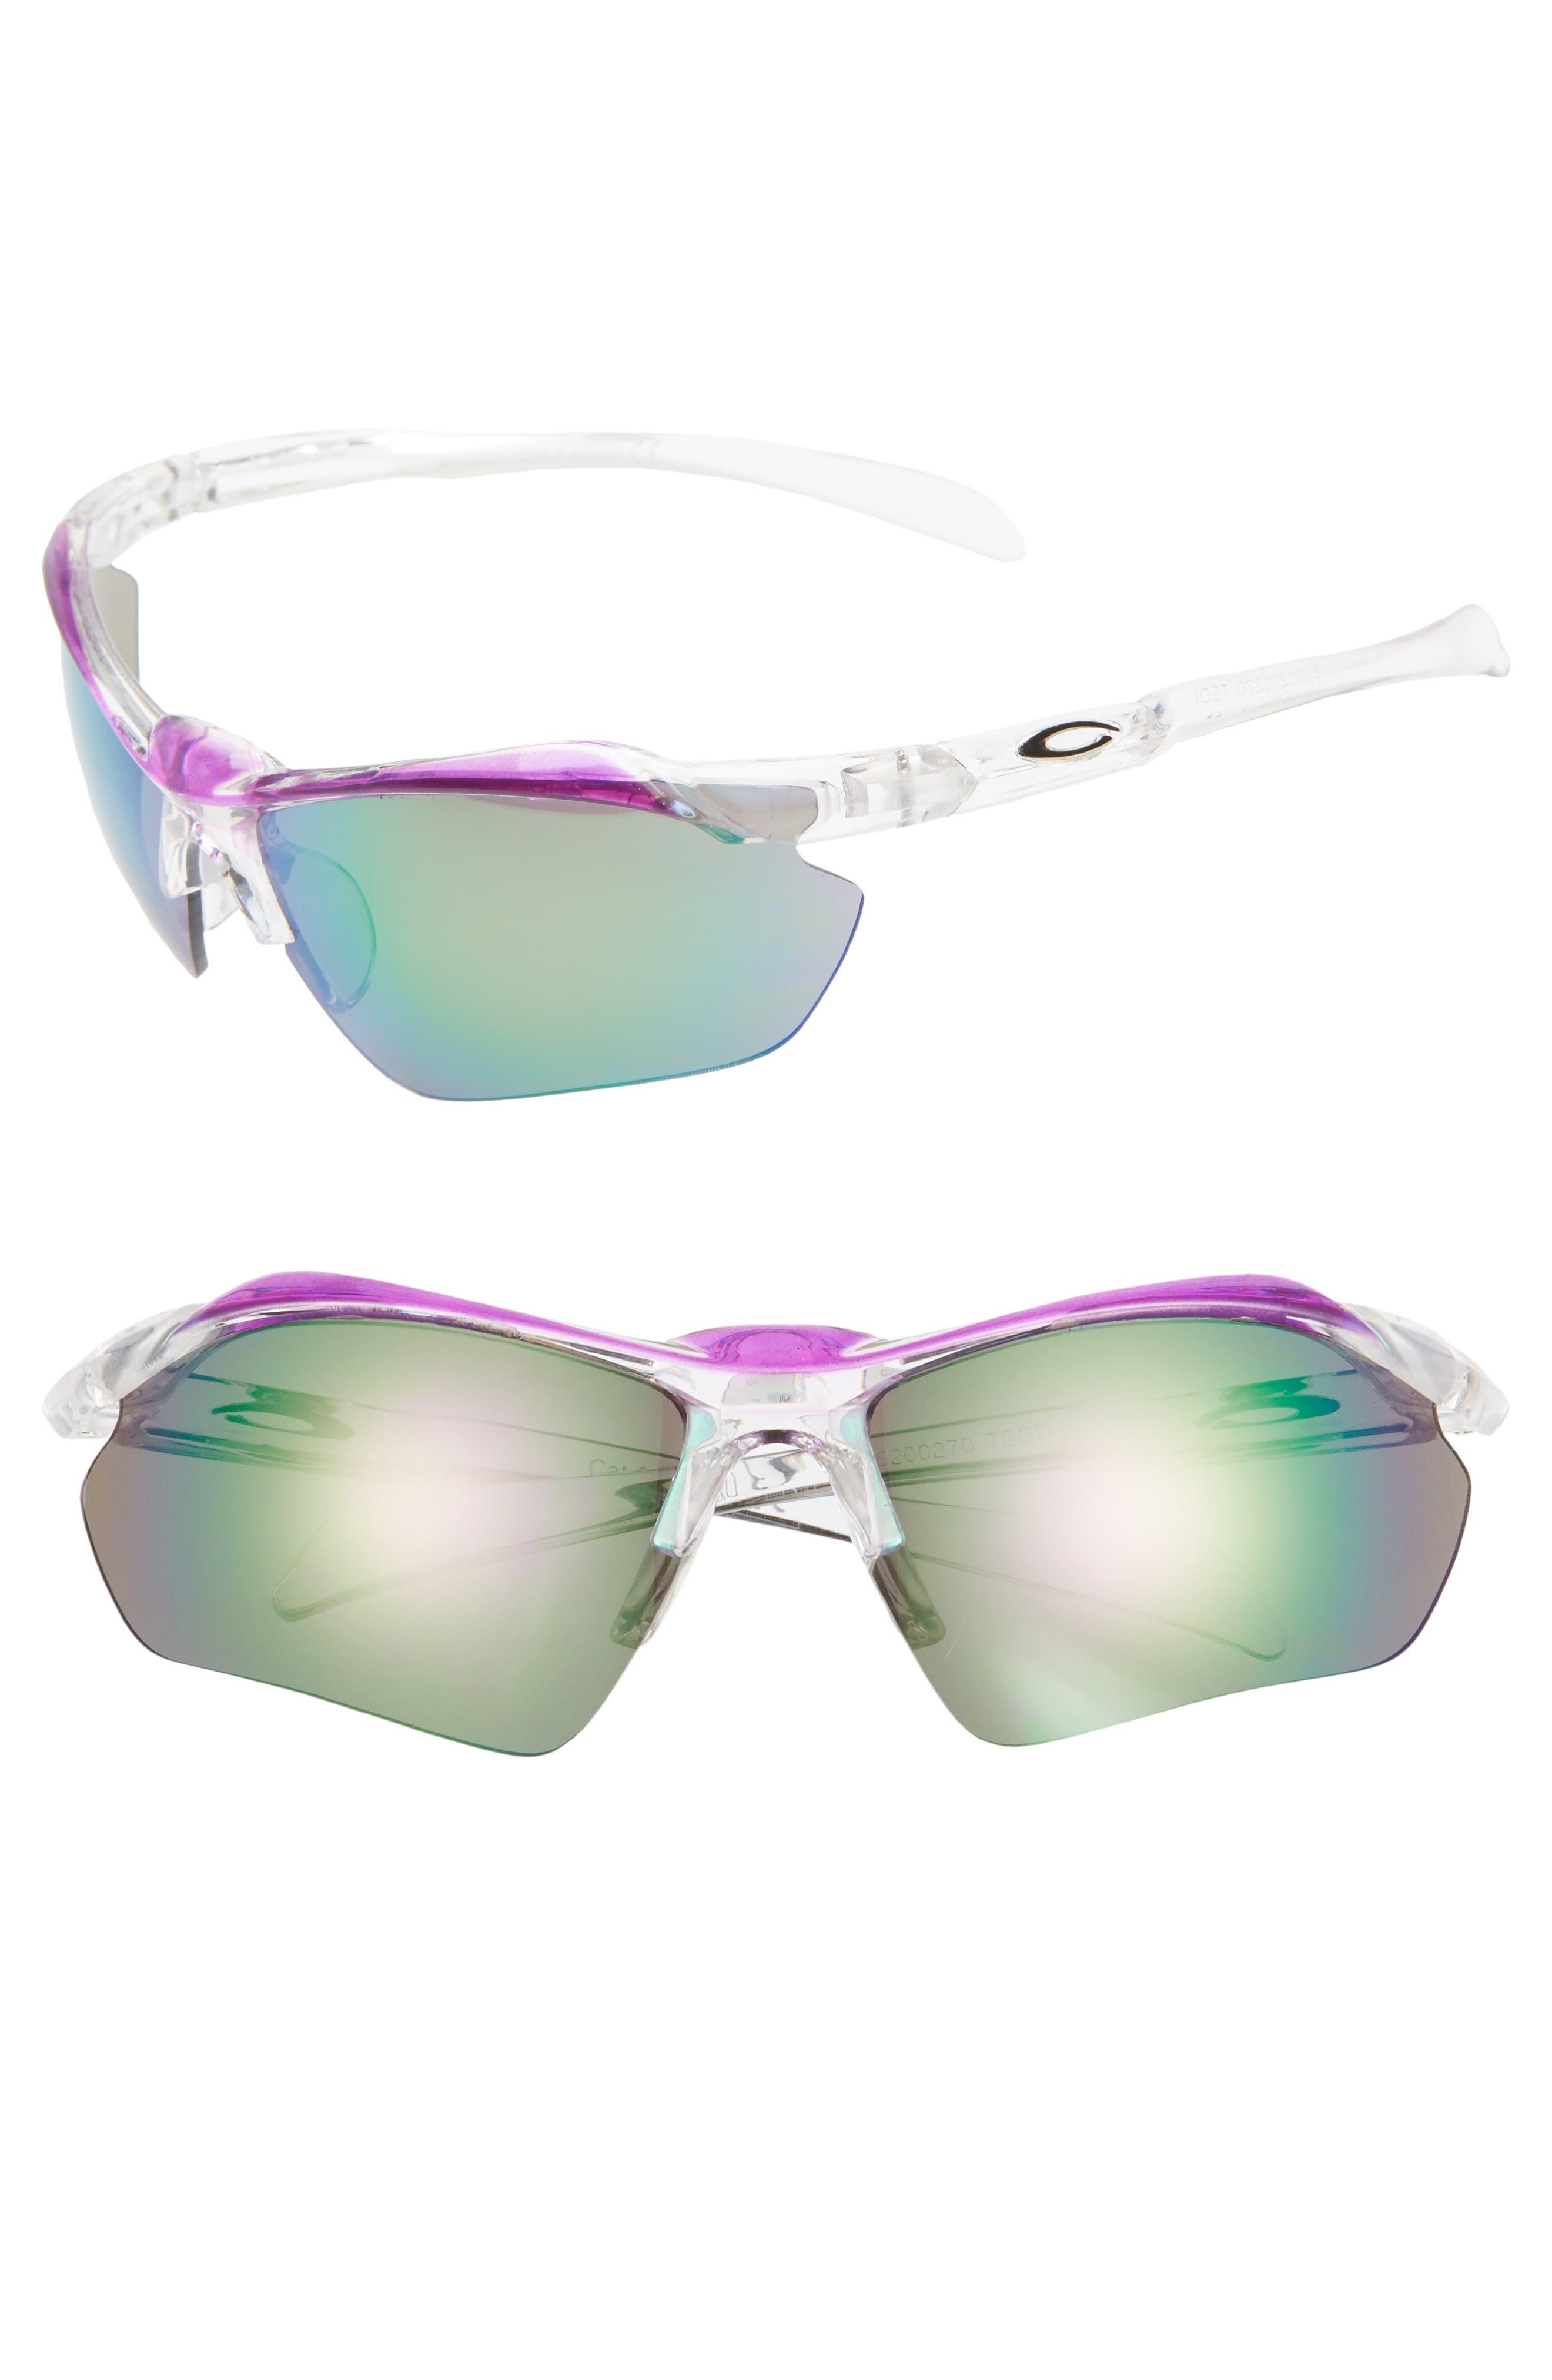 68mm Sport Shield Sunglasses,                             Main thumbnail 1, color,                             CLEAR/ PURPLE